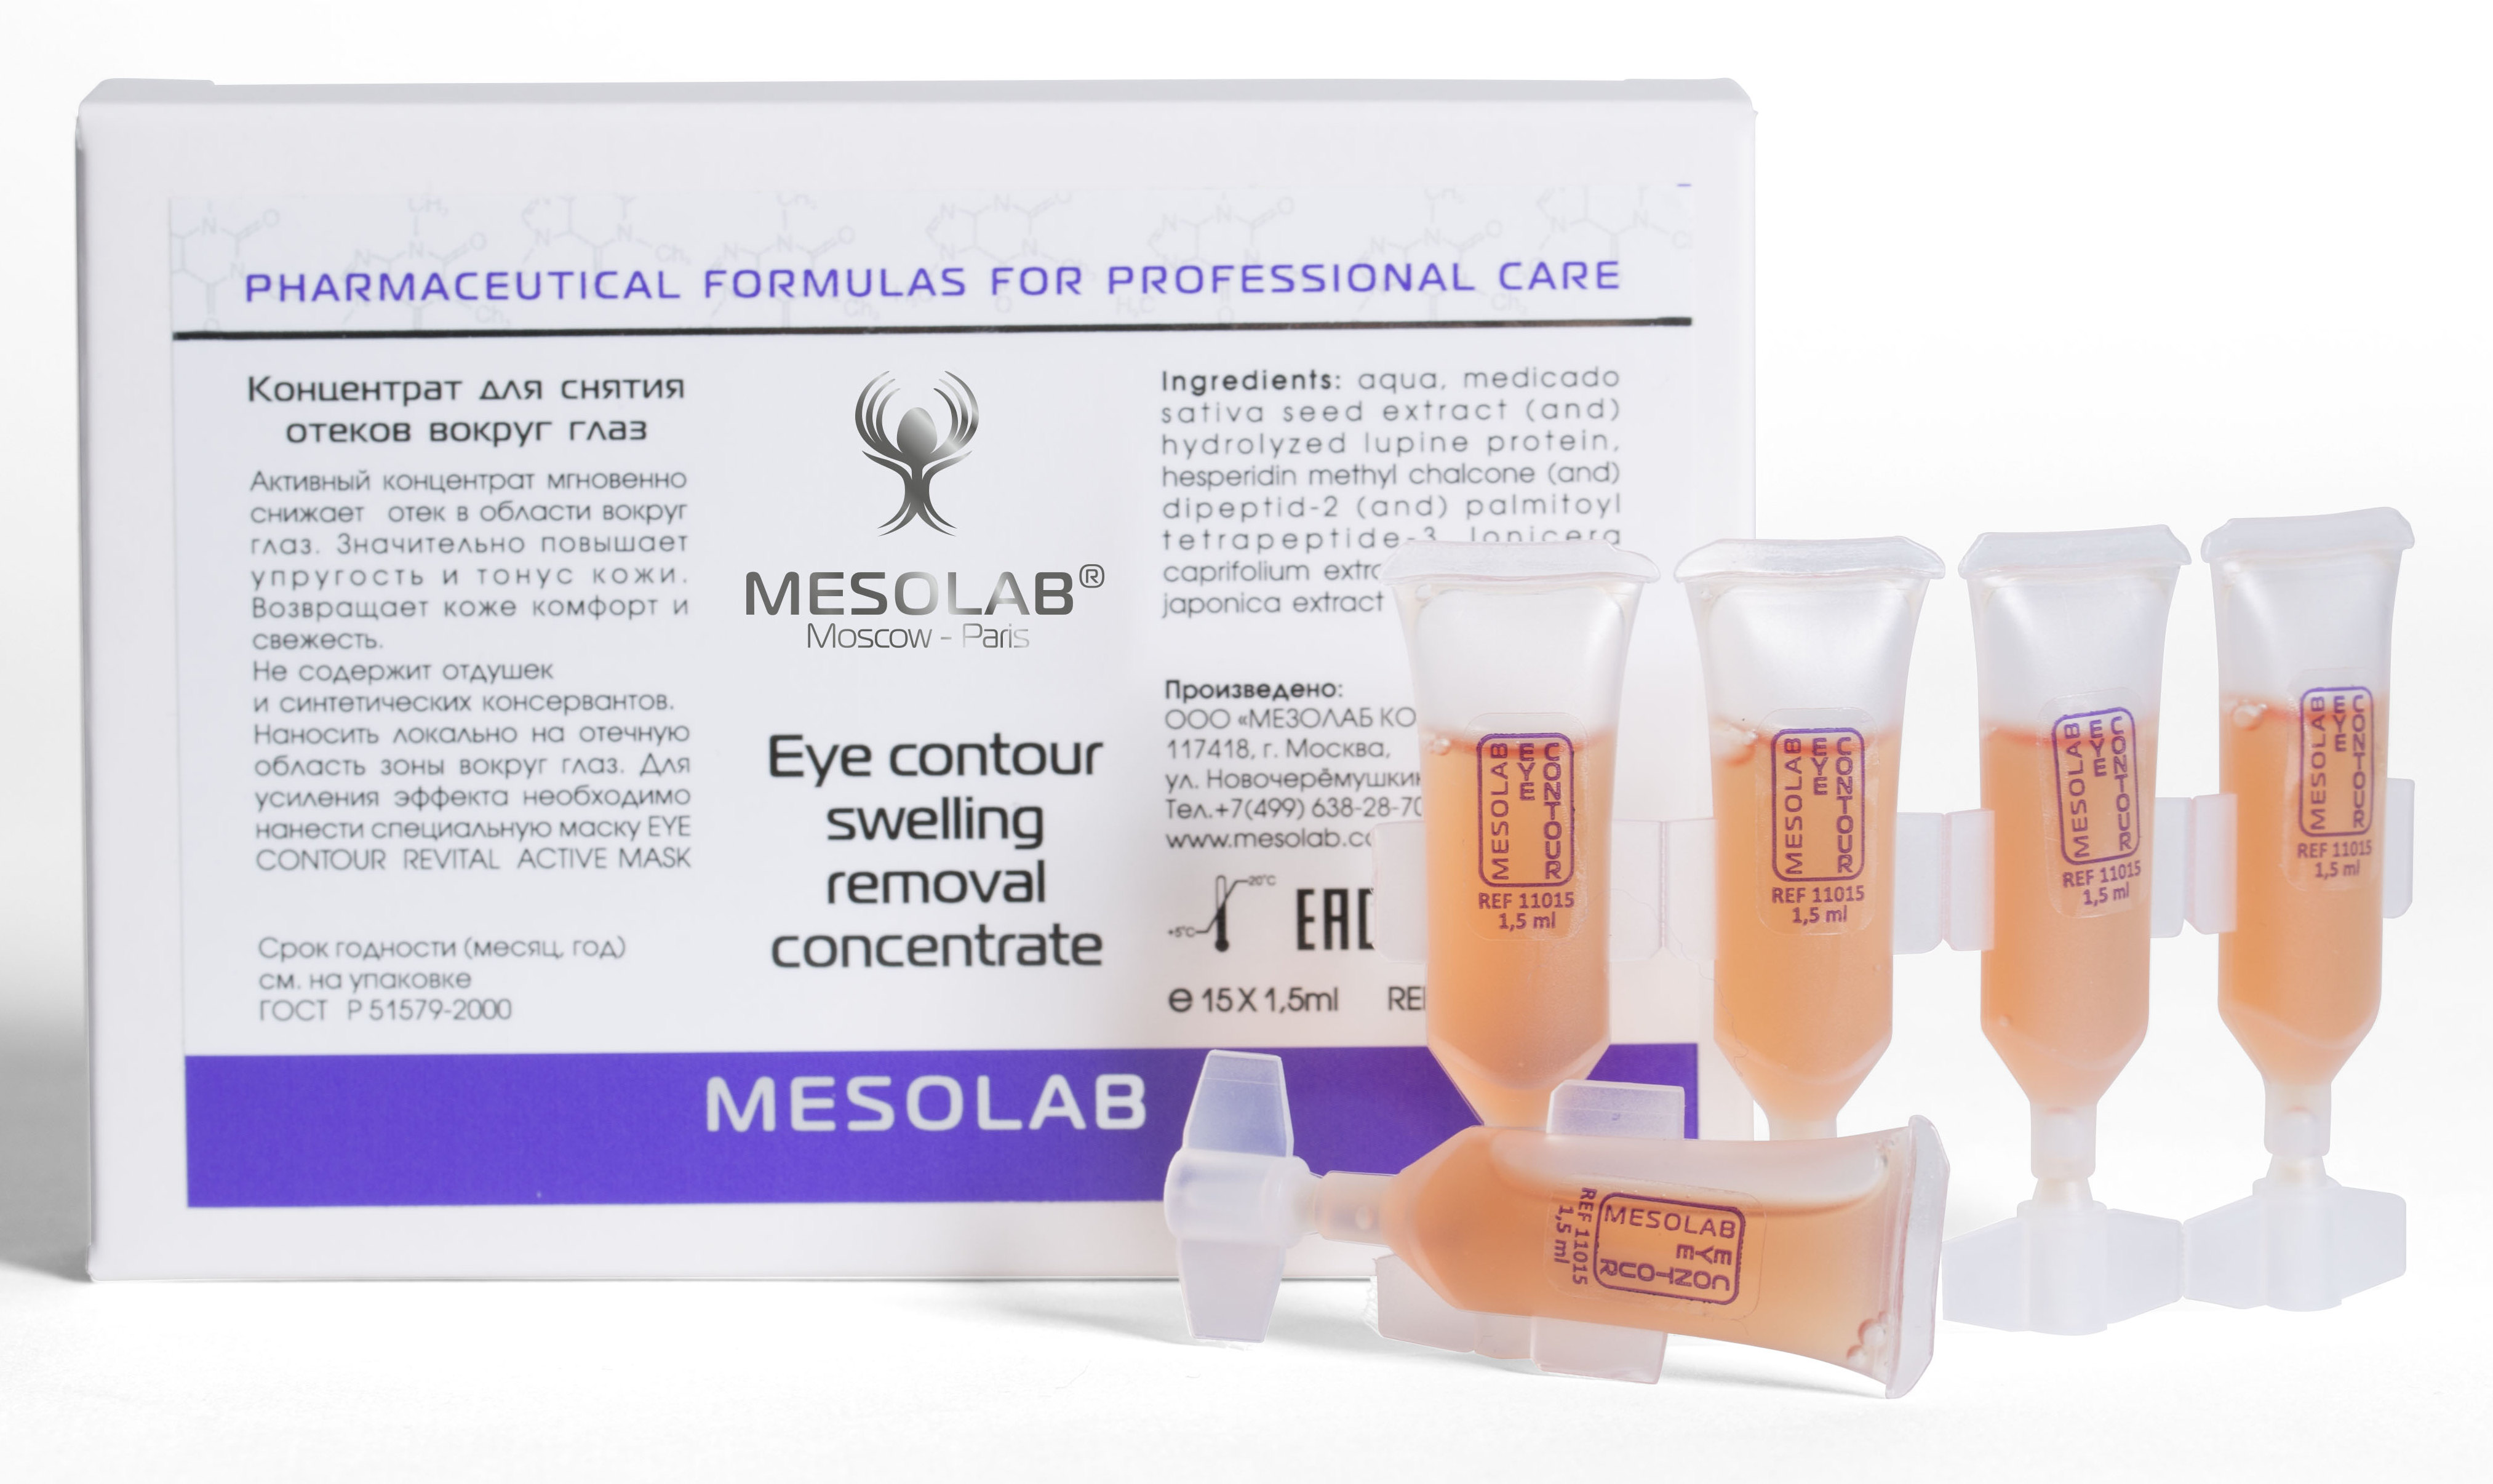 MESOLAB Концентрат для снятия отеков вокруг глаз / EYE CONTOUR SWELLING REMOVAL CONCENTRATE 15*1,5 мл